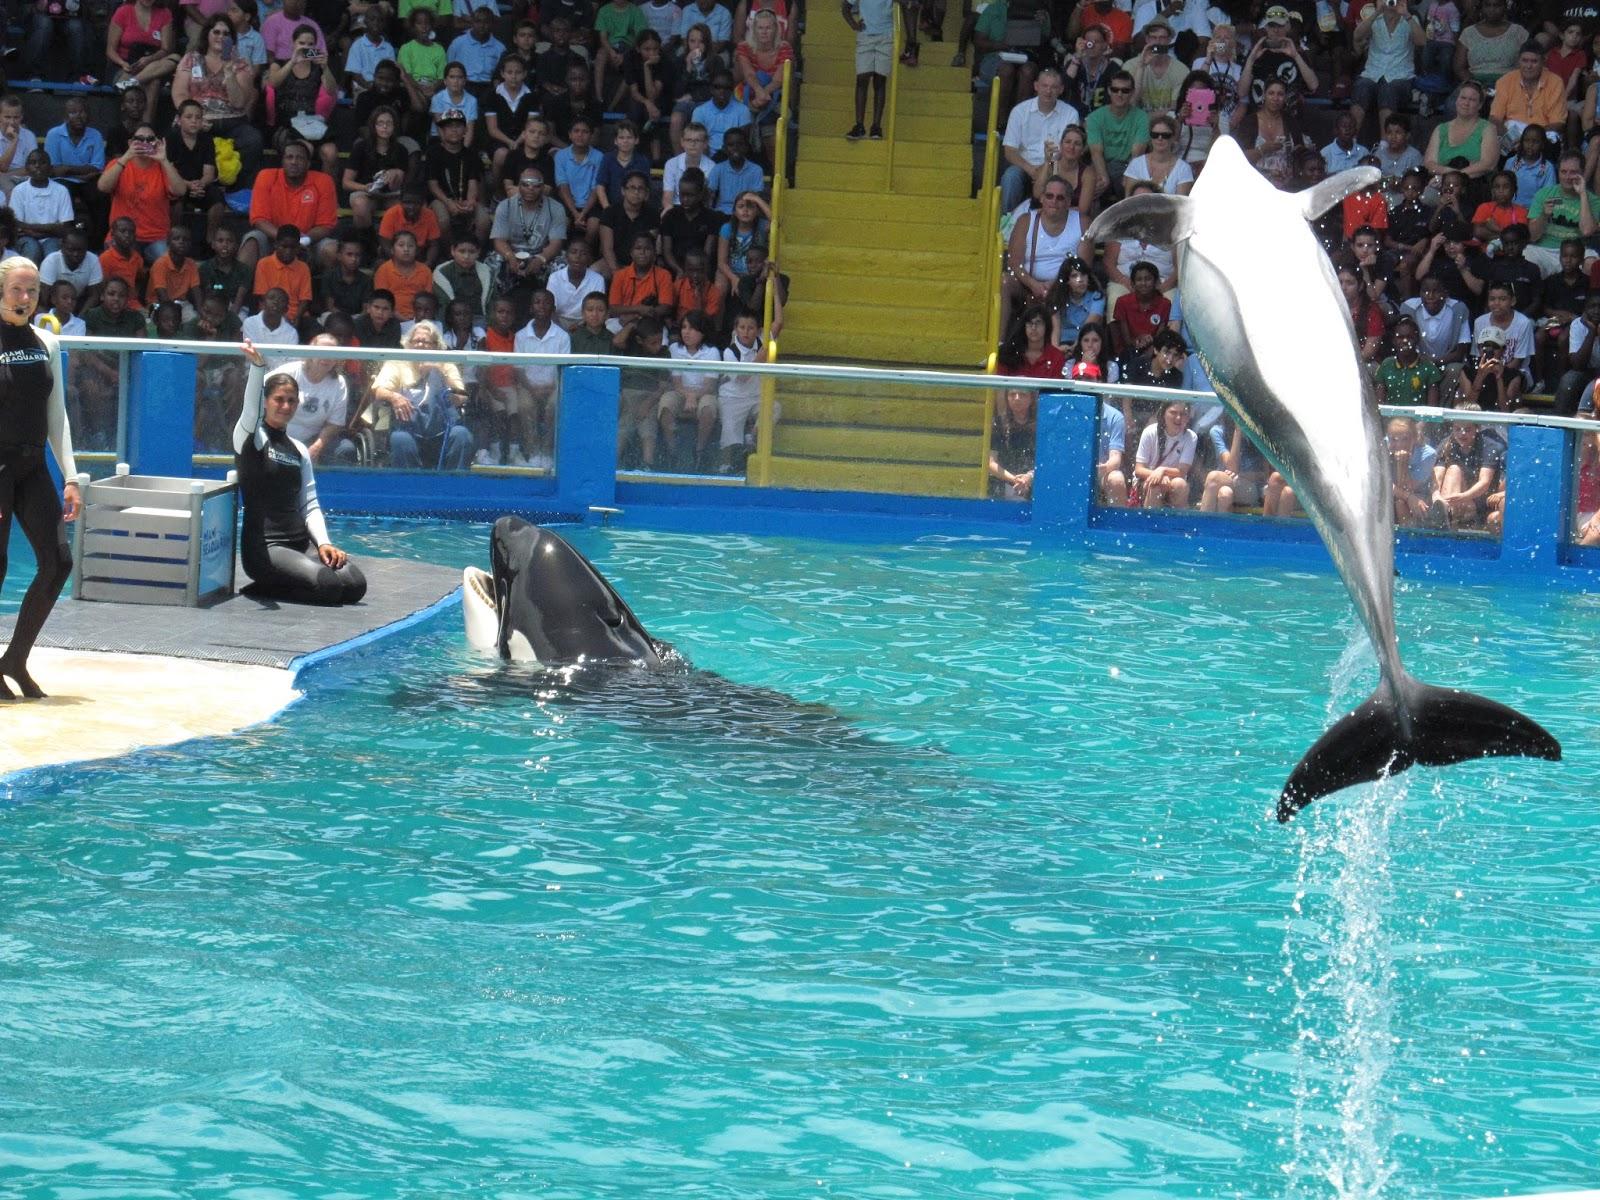 Killer Whale Show at Miami Seaquarium, FL - ouroutdoortravels.blogspot.com